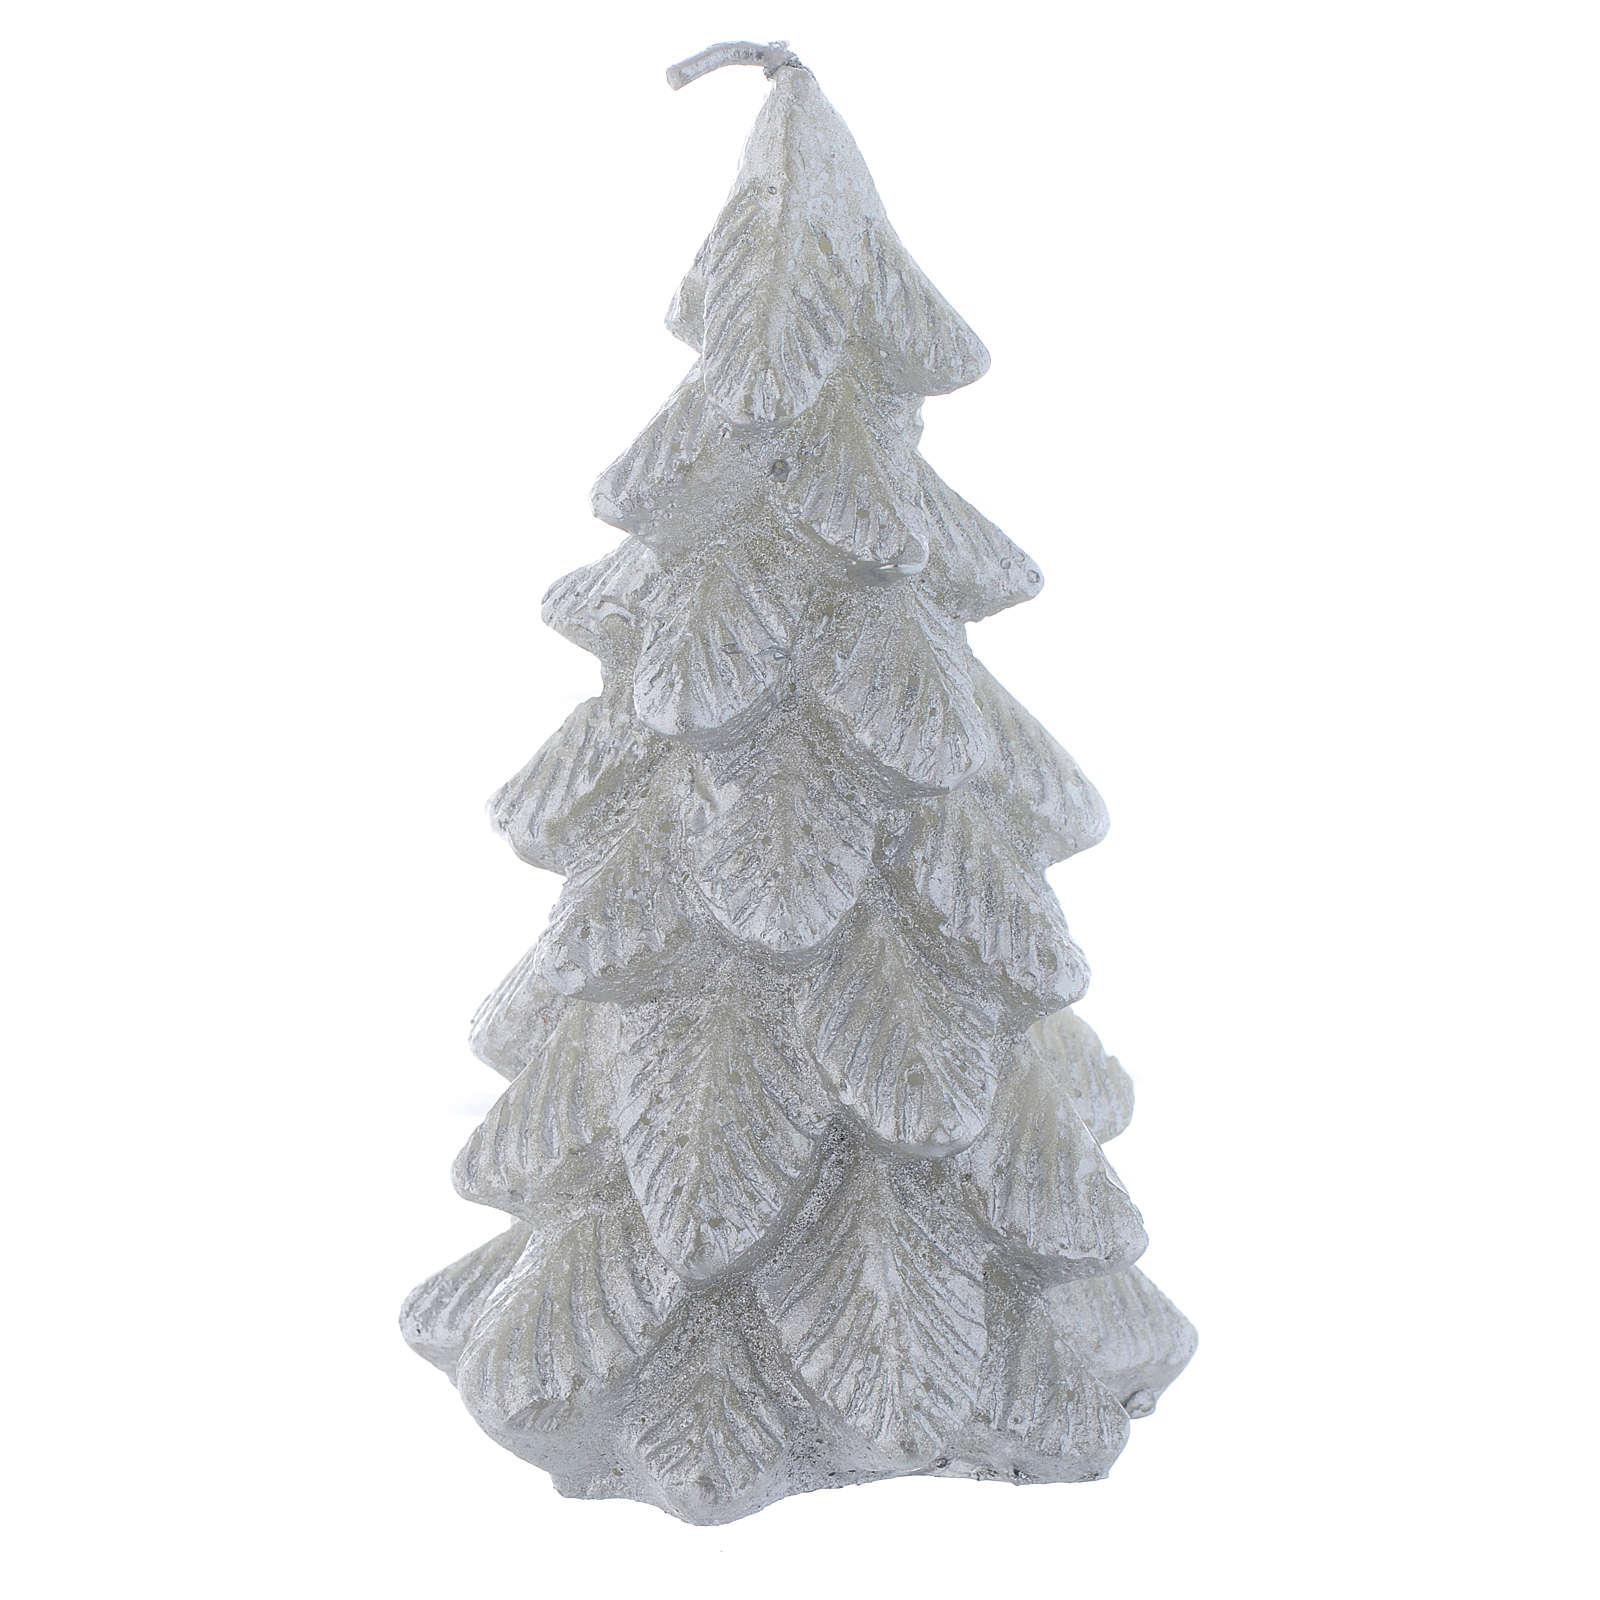 Vela Árbol de Navidad plata 11 cm 3